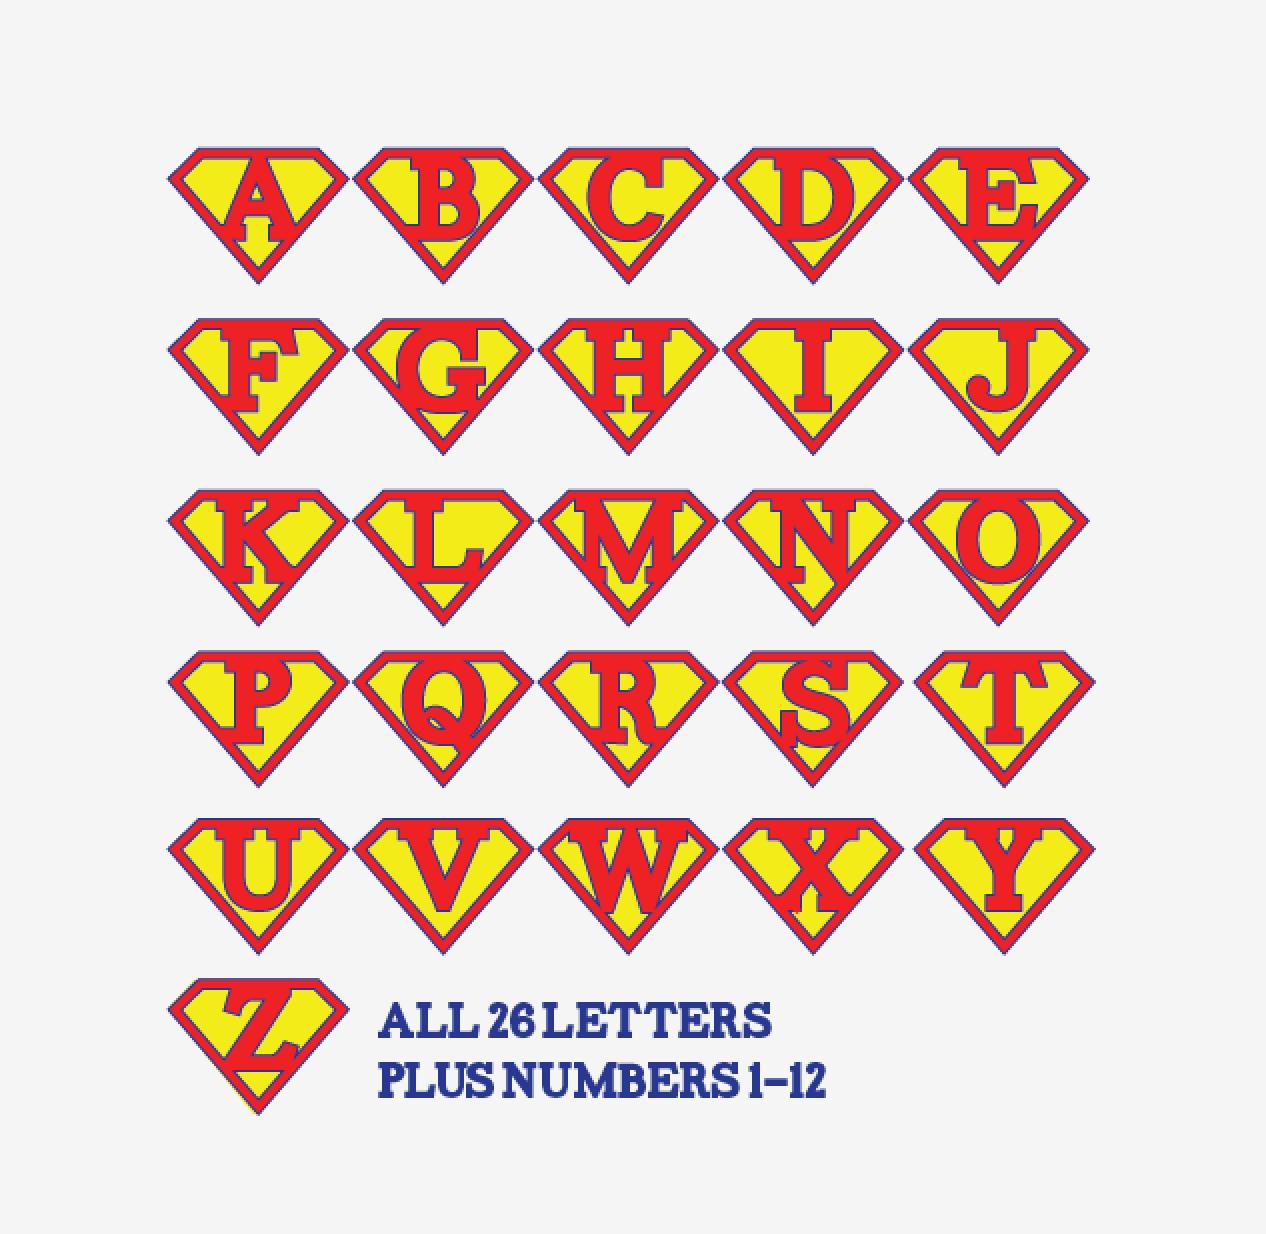 Printable Superman Birthday Banner For A Super Hero Birthday Party - Free Printable Disney Alphabet Letters